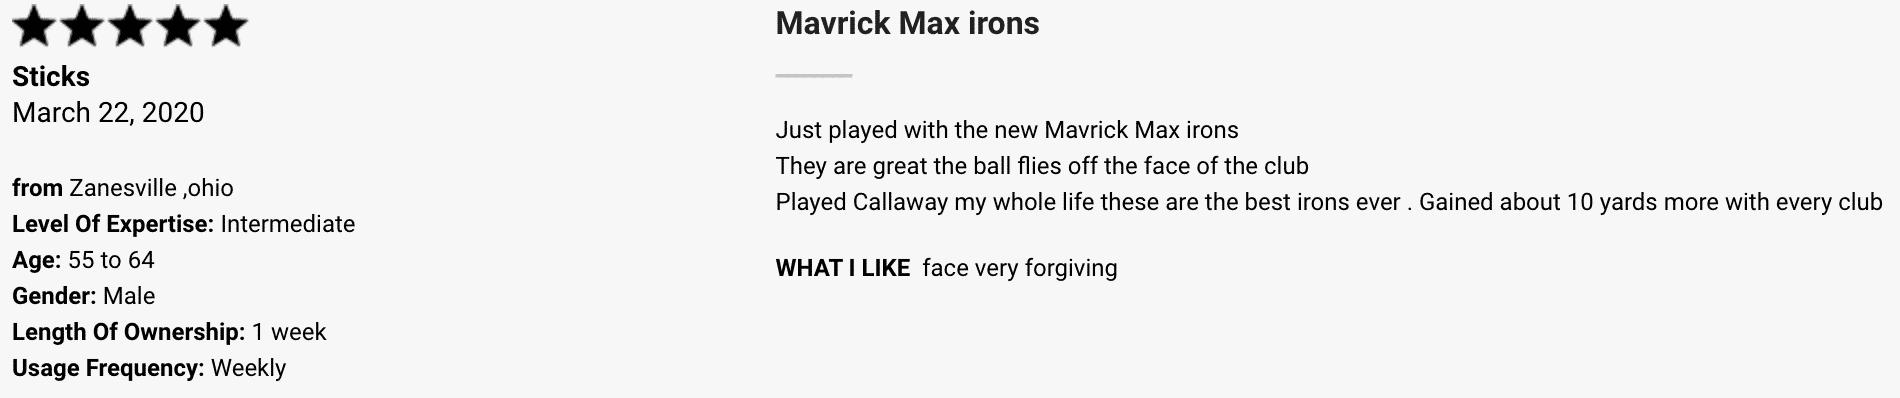 Callaway Mavrik Max Iron Customer Review